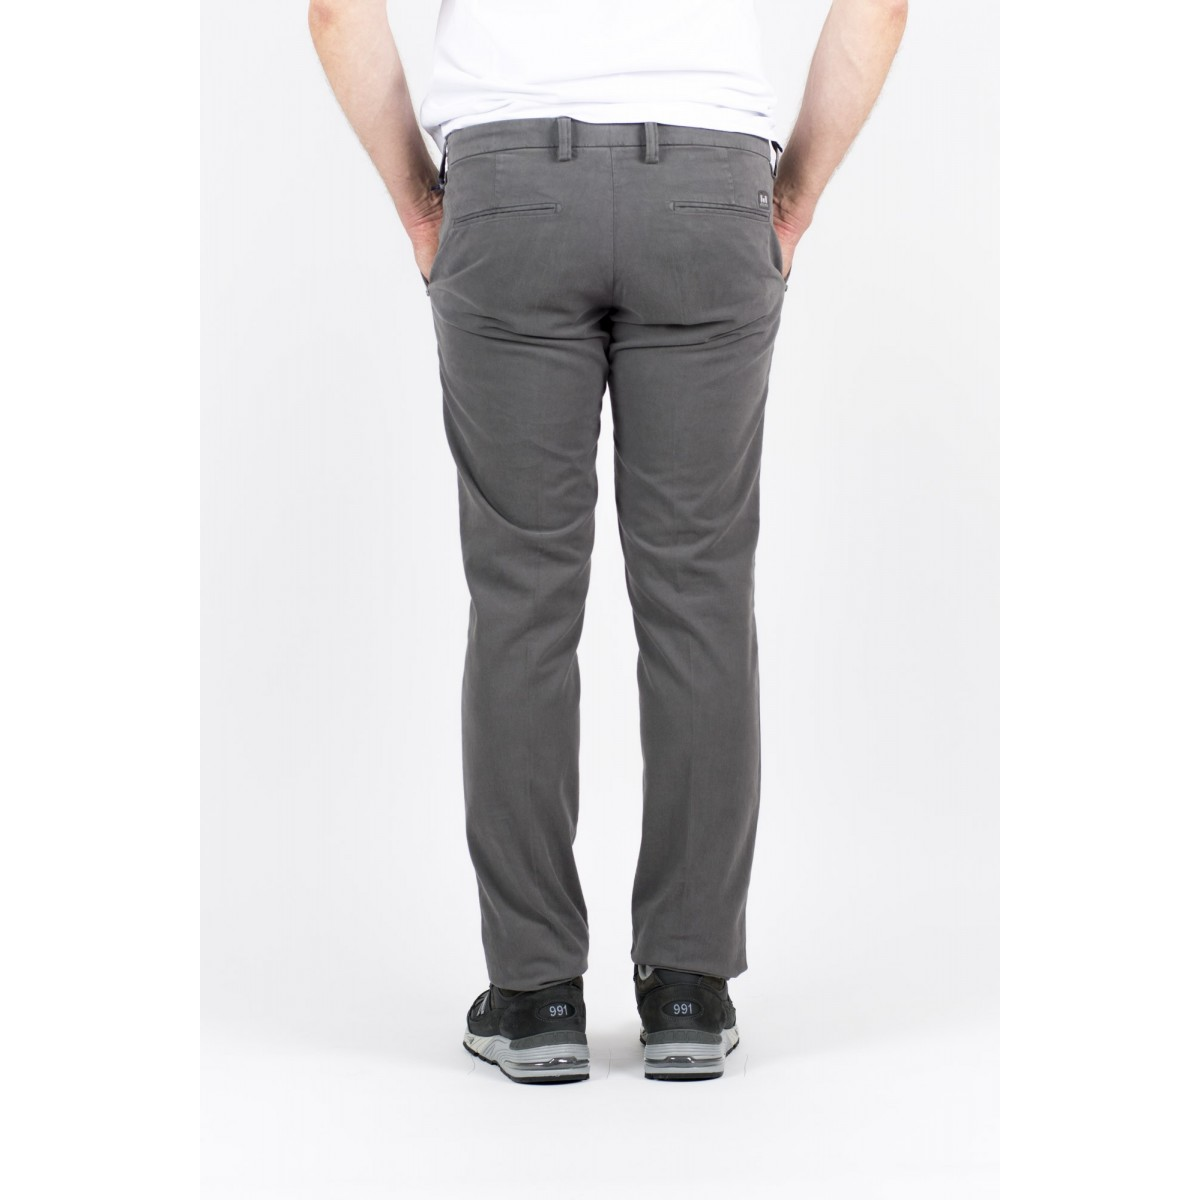 Pantalone uomo Entre amis - Pantalone tasca america slim con fondo 16cm 302 - Grigio